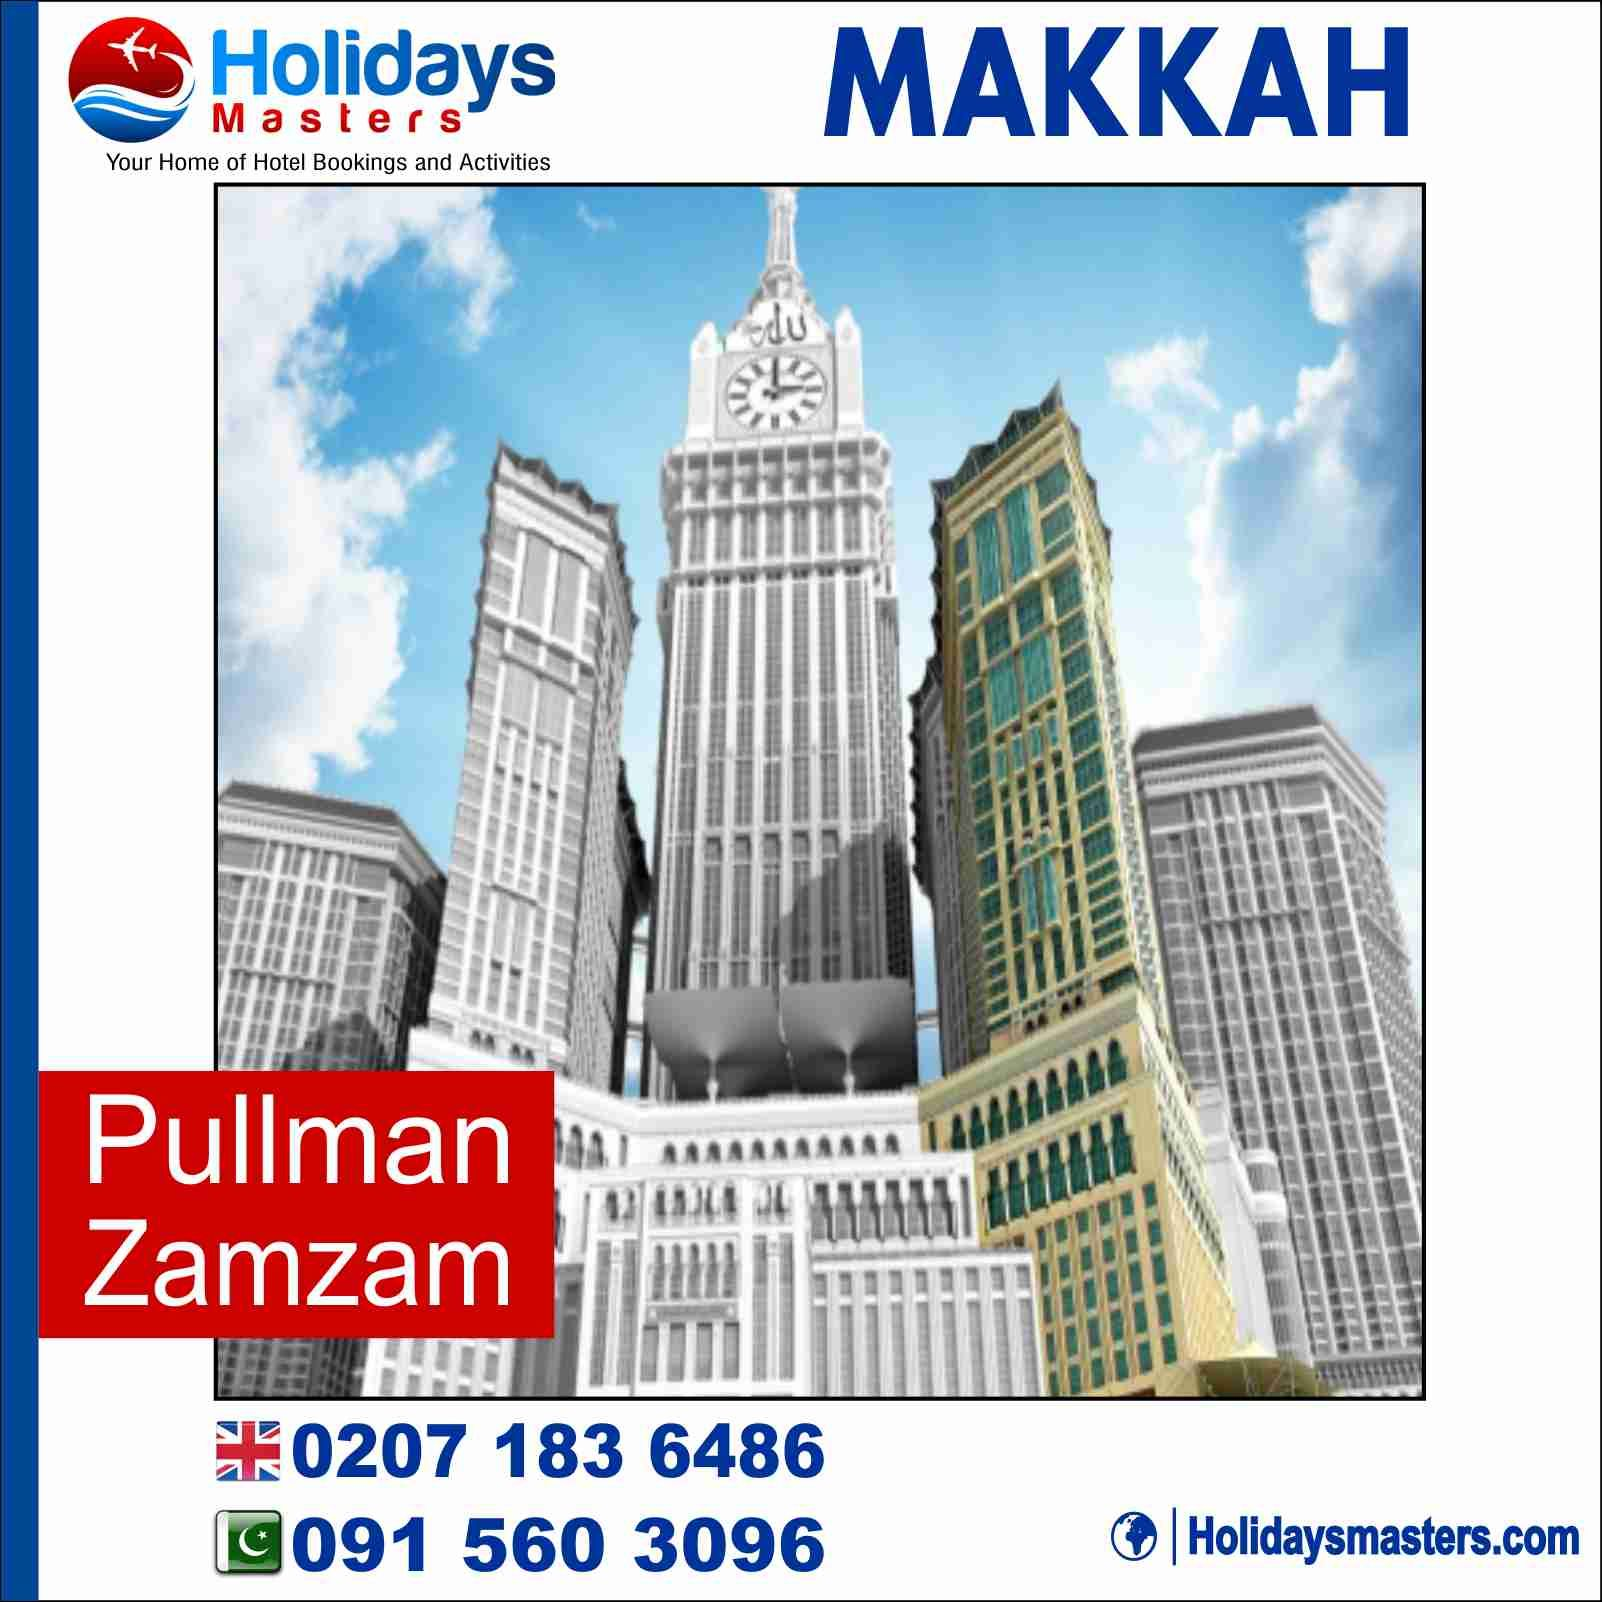 Hotel Pullman Zamzam Makkah Cheap Hotel Deals Hotel Hotel Deals